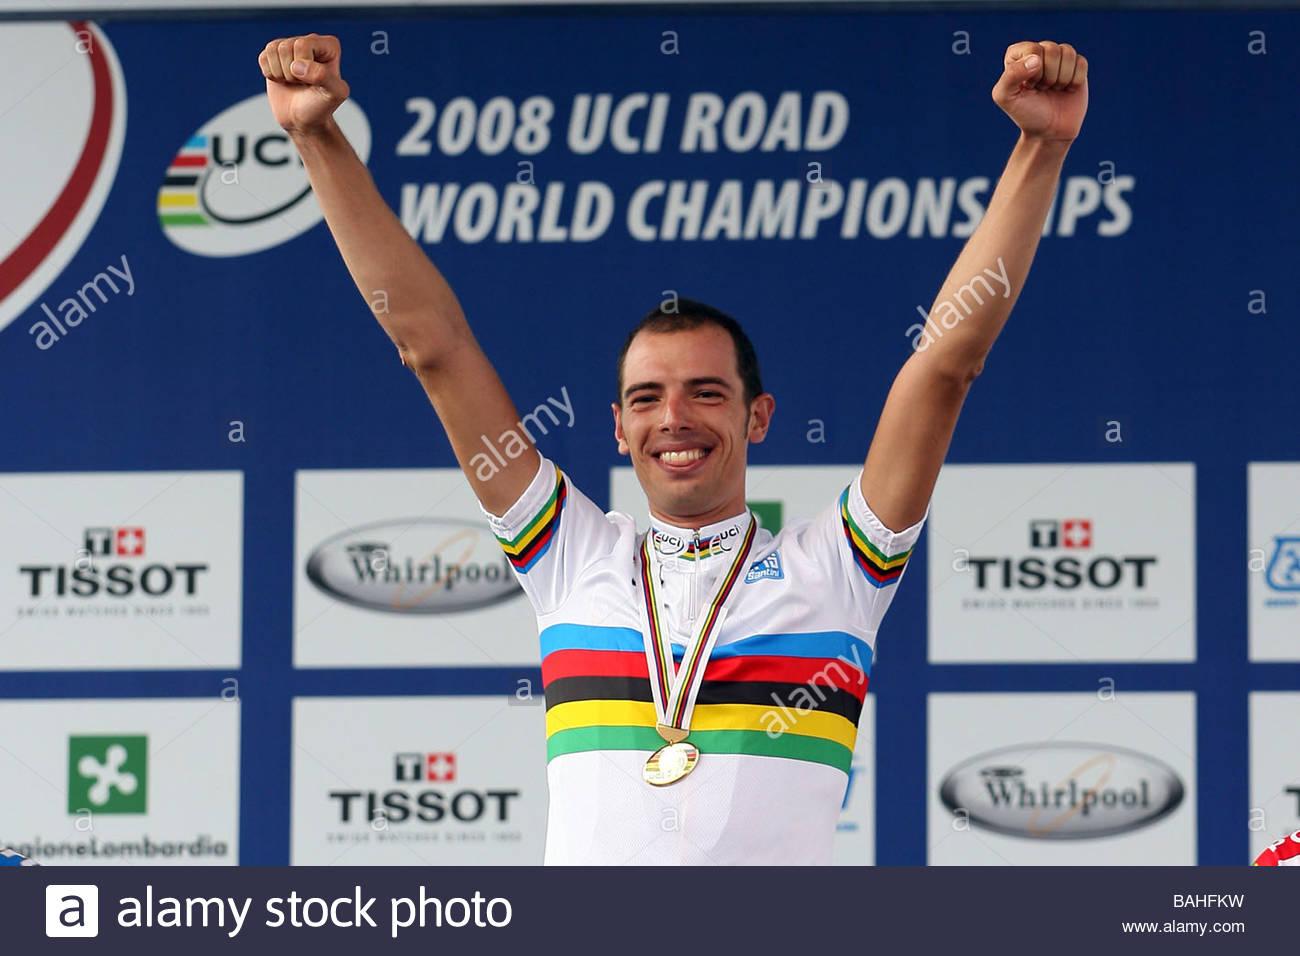 alessandro balla'varese 28-09-2008'road cycling world championships, varese 2008'photo gianni nava/markanews - Stock Image